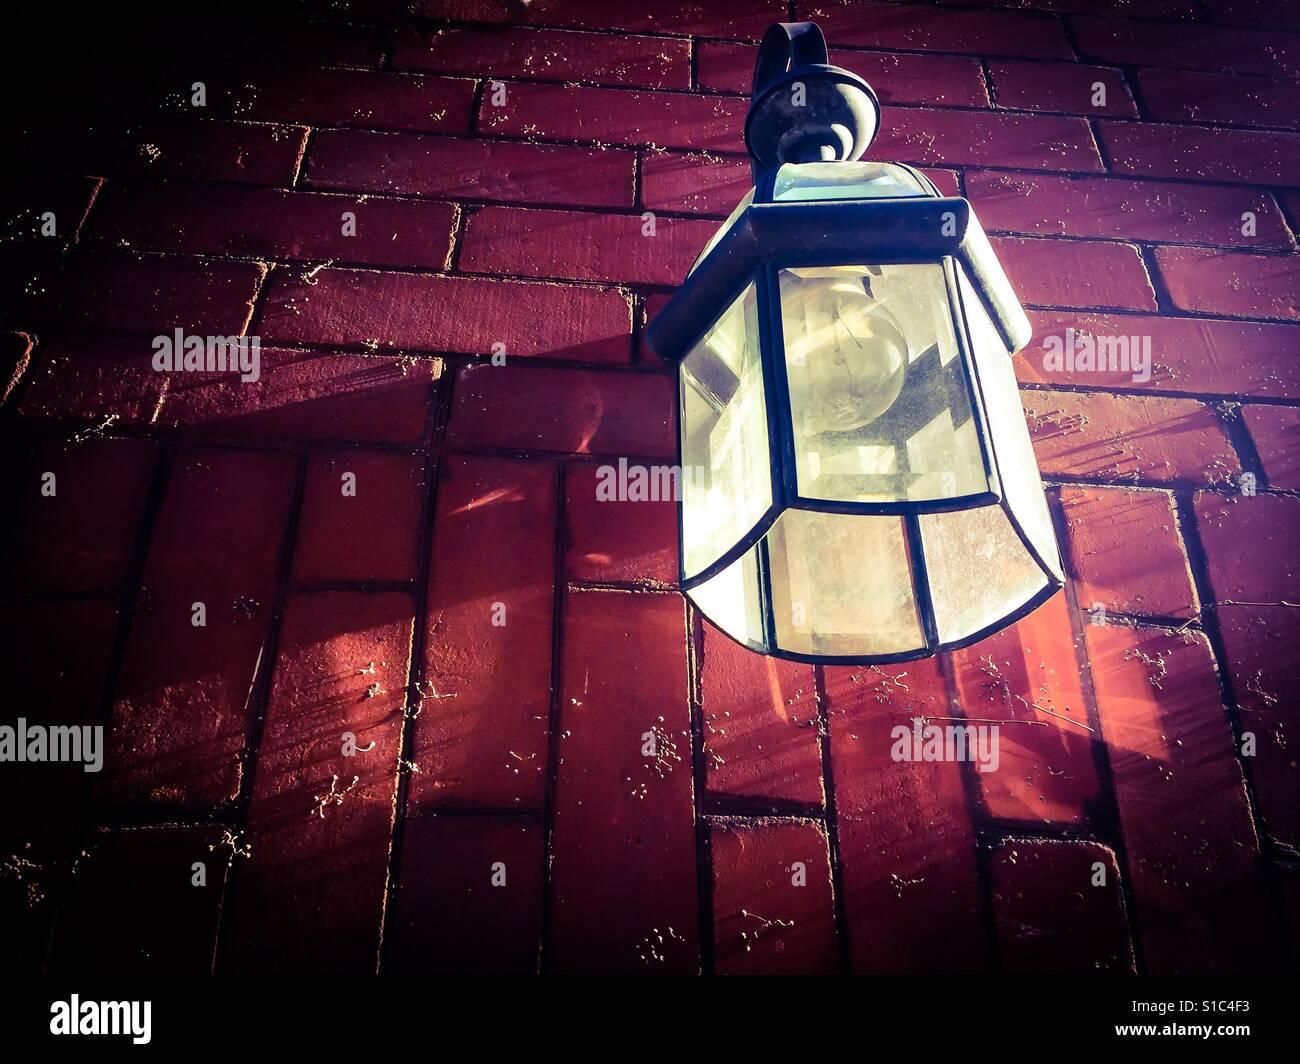 Light and shadows - Stock Image